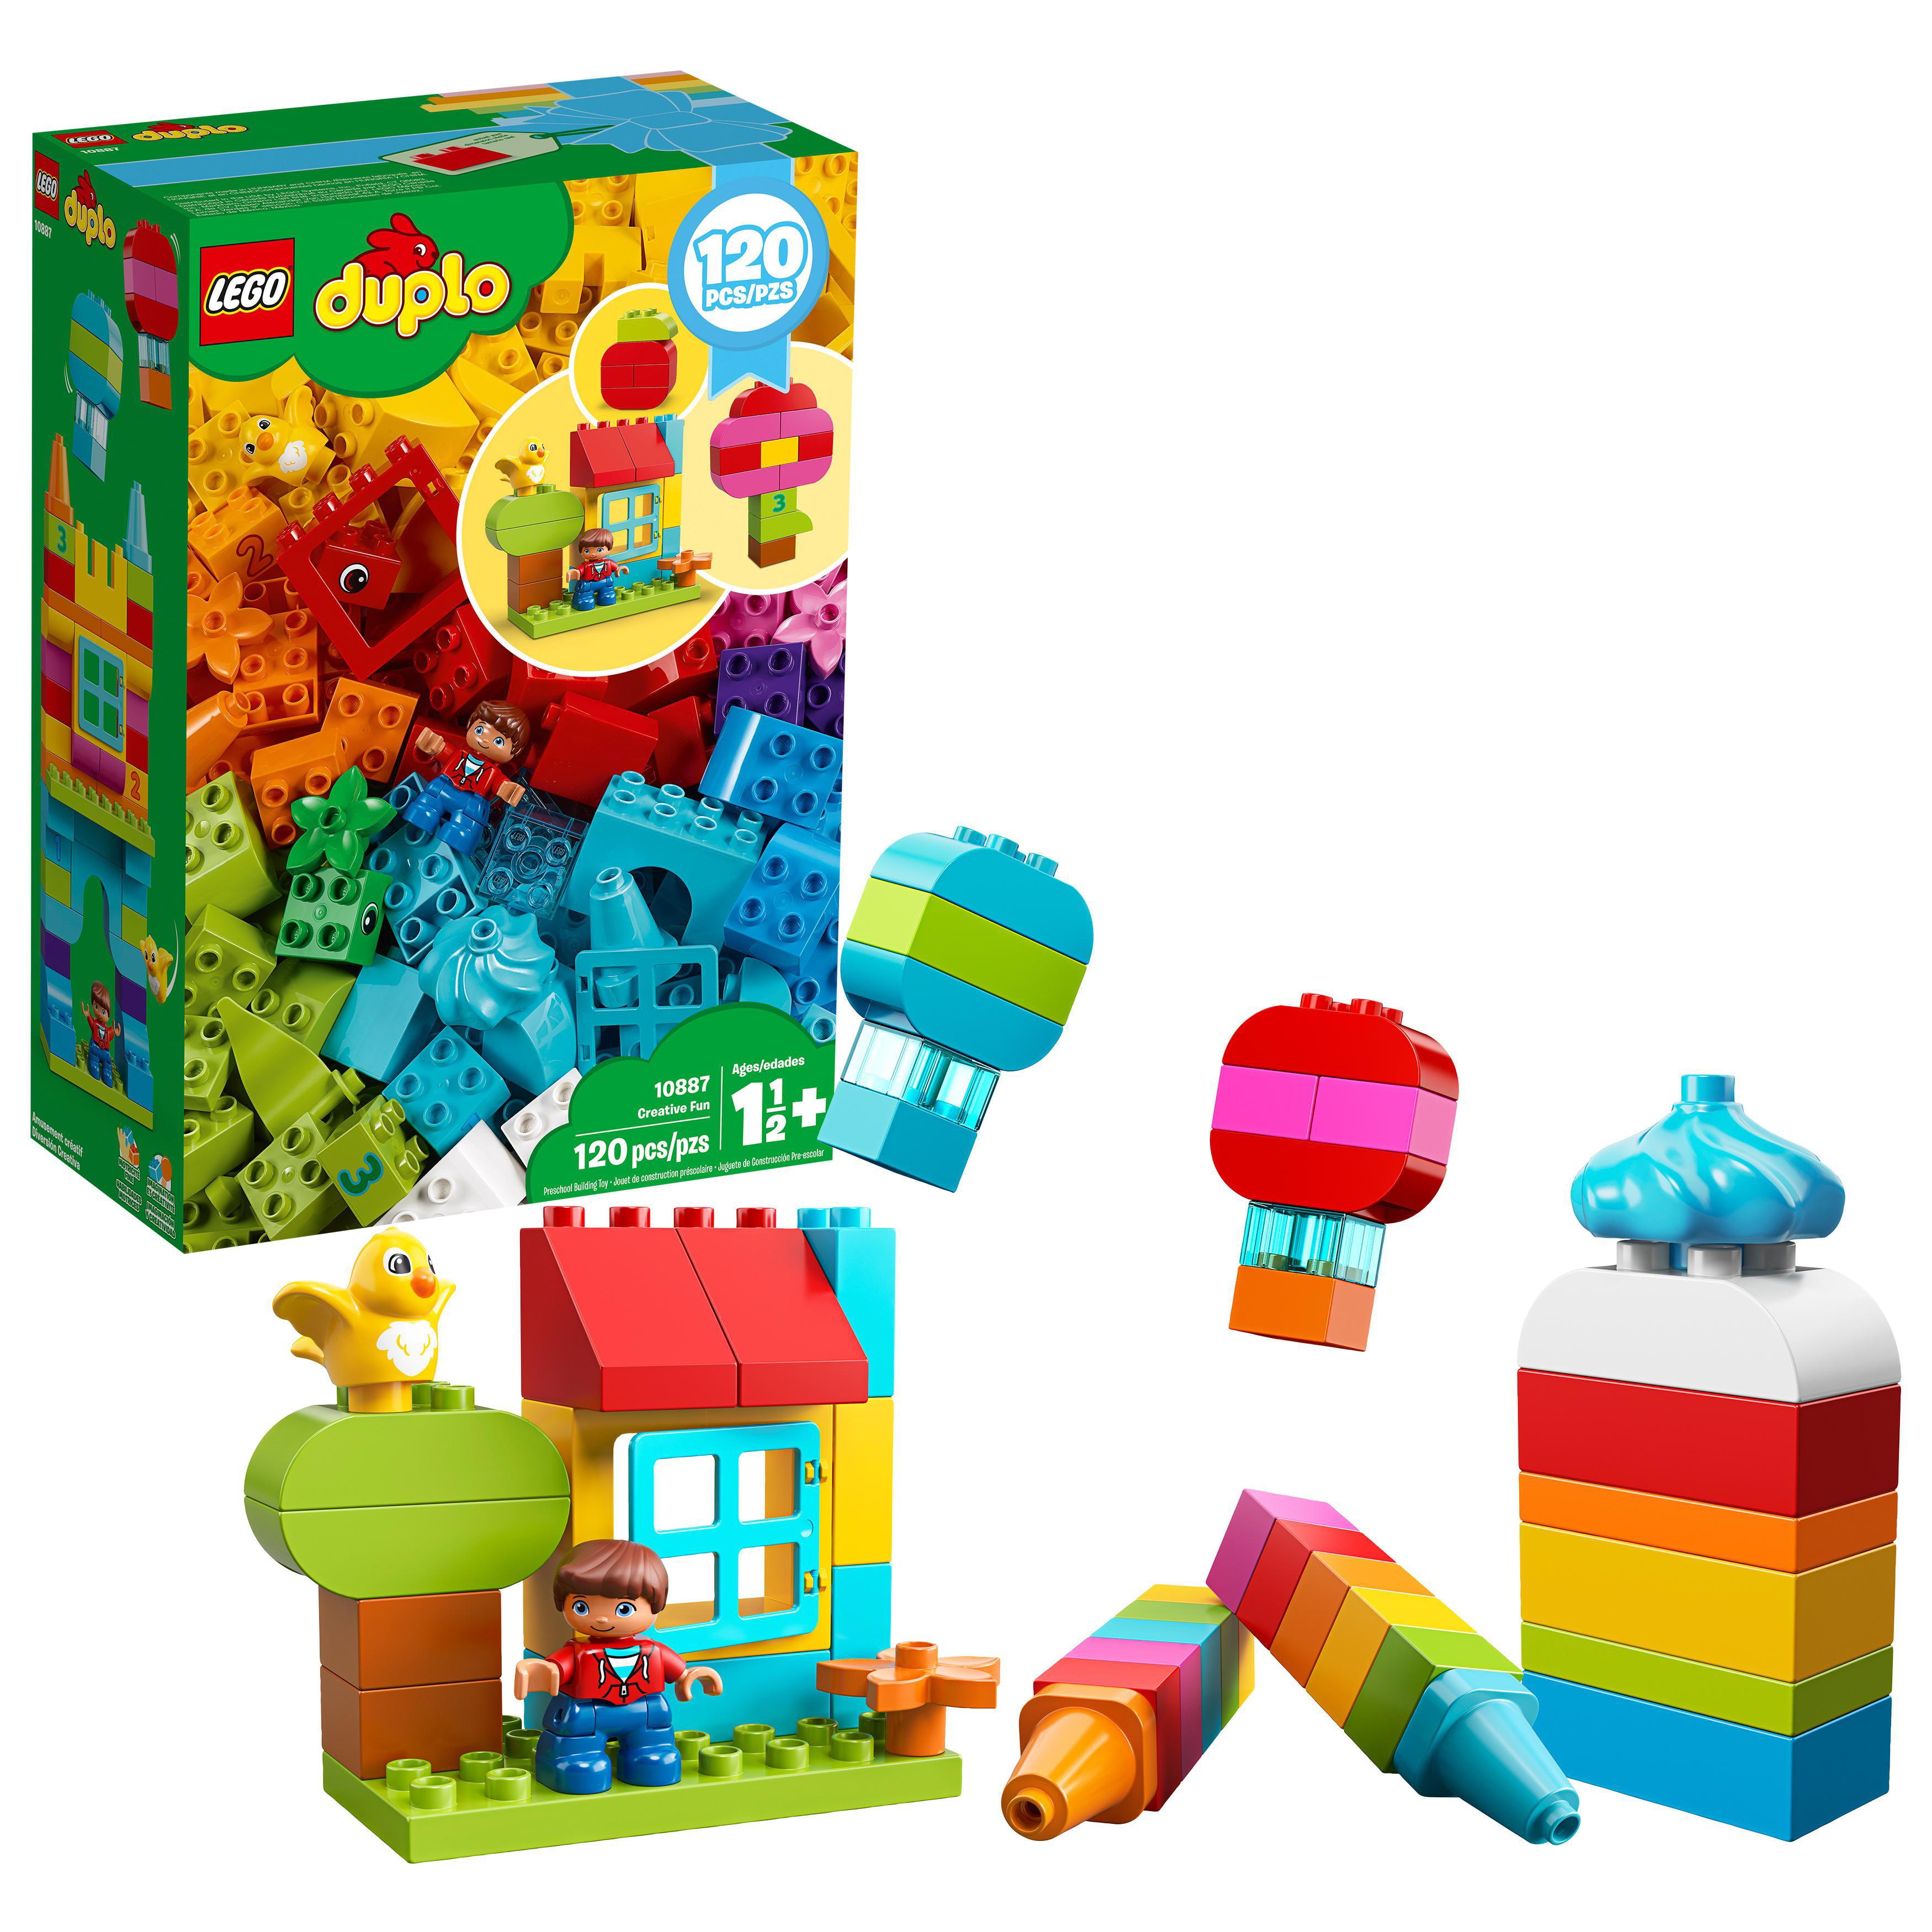 LEGO DUPLO Creative Play Master Shed Toddler Cars Large Building Blocks Kids